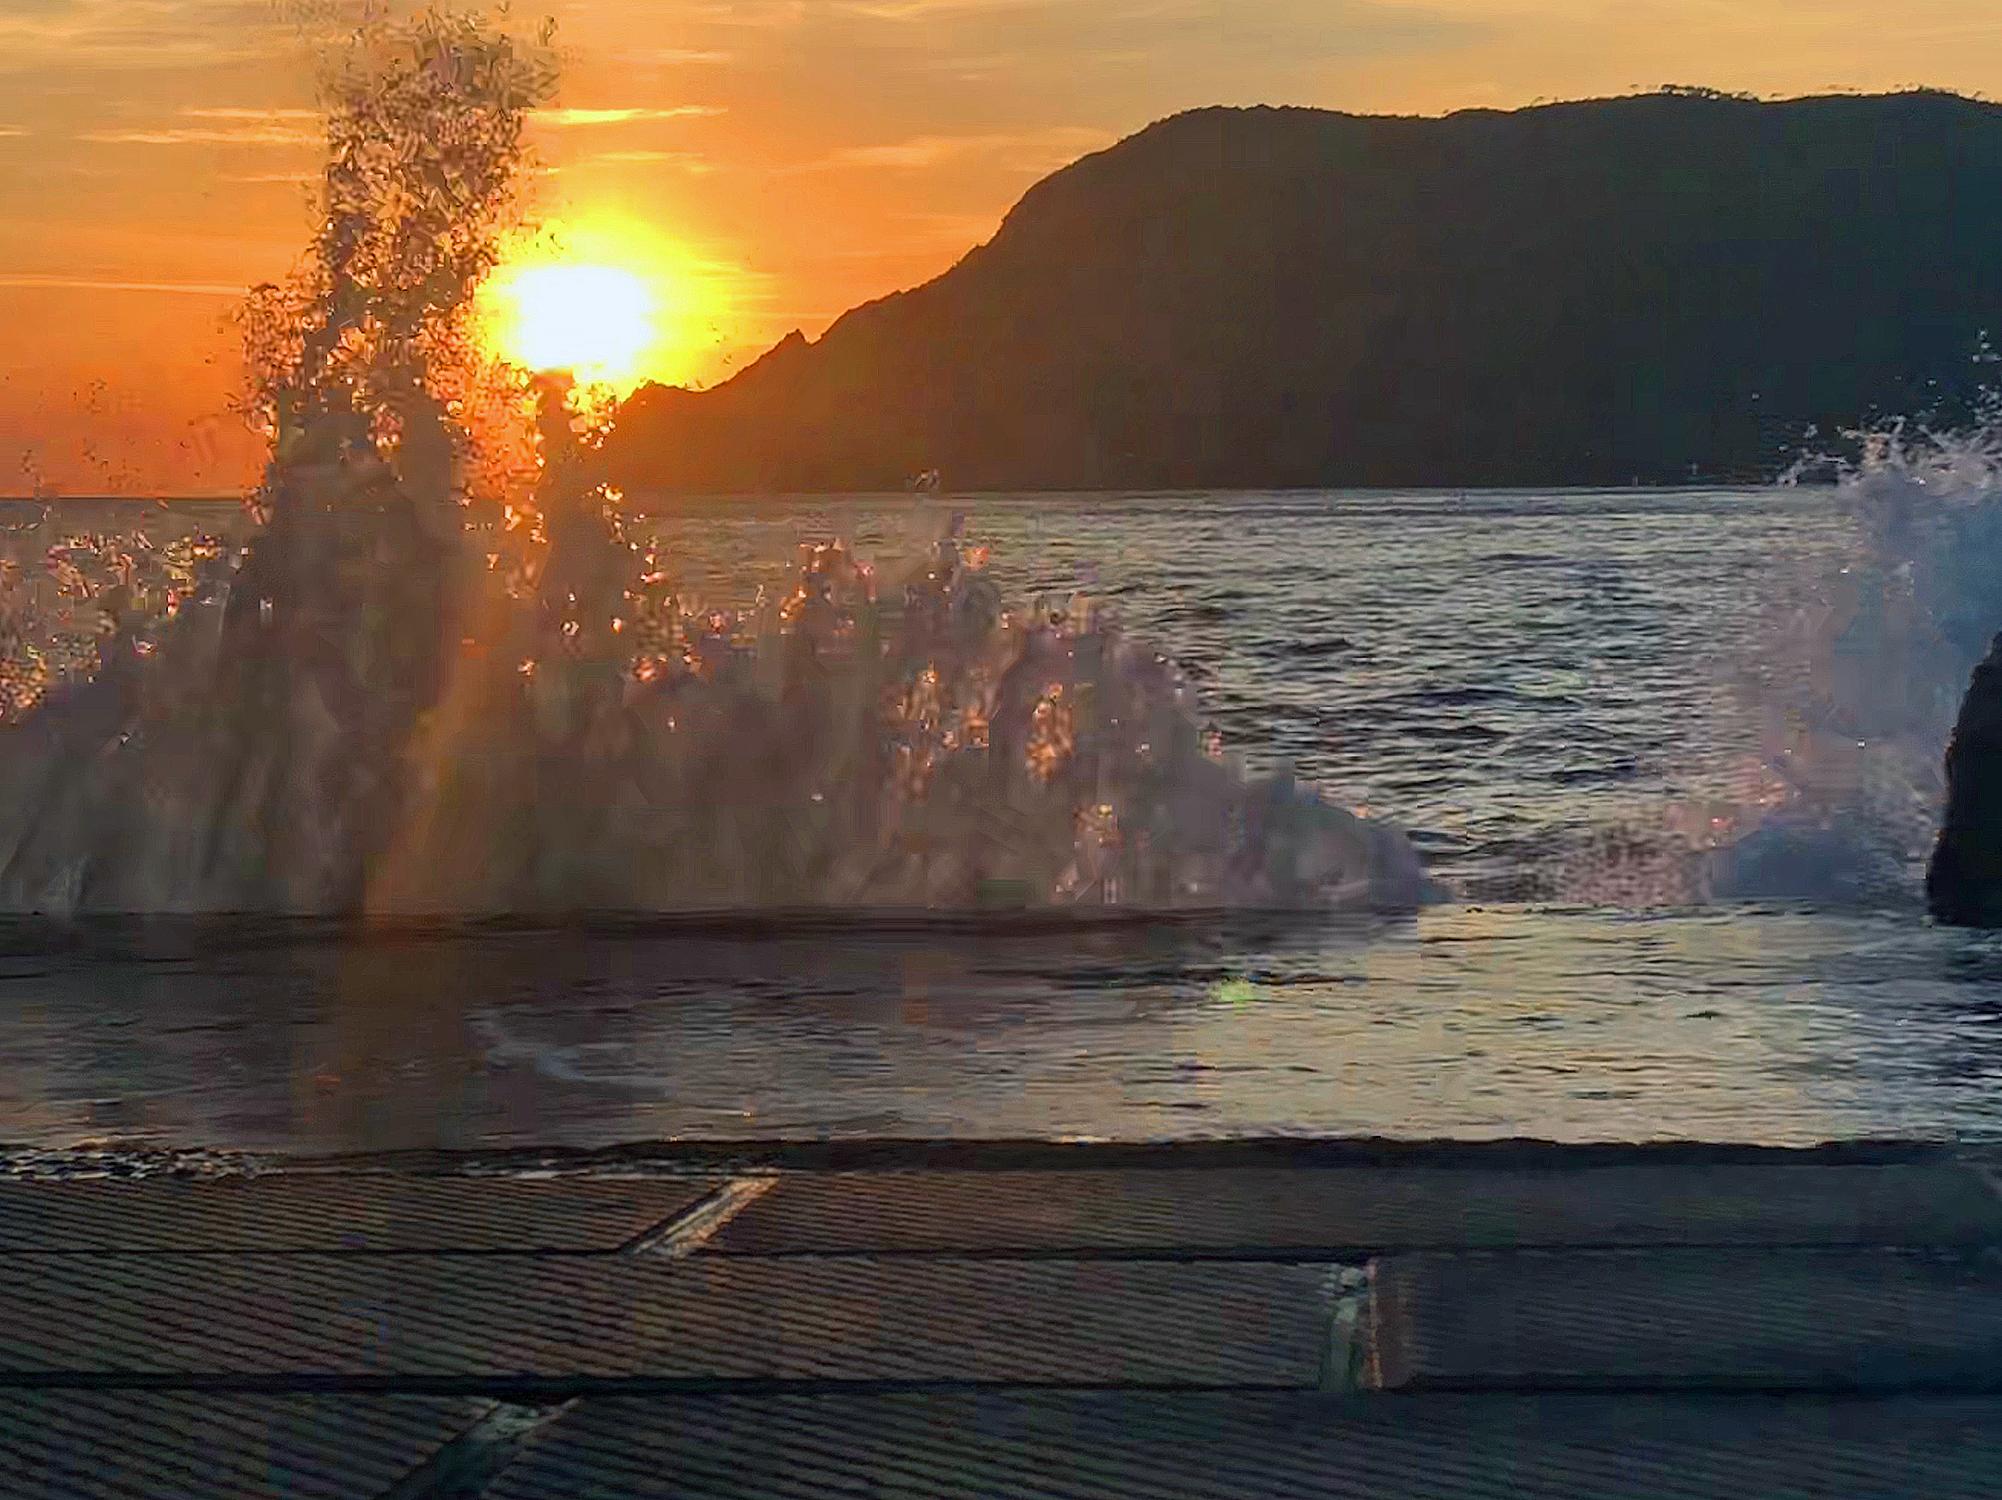 2018 ITALY_cinque terre_vernazza_sunset marina.jpg